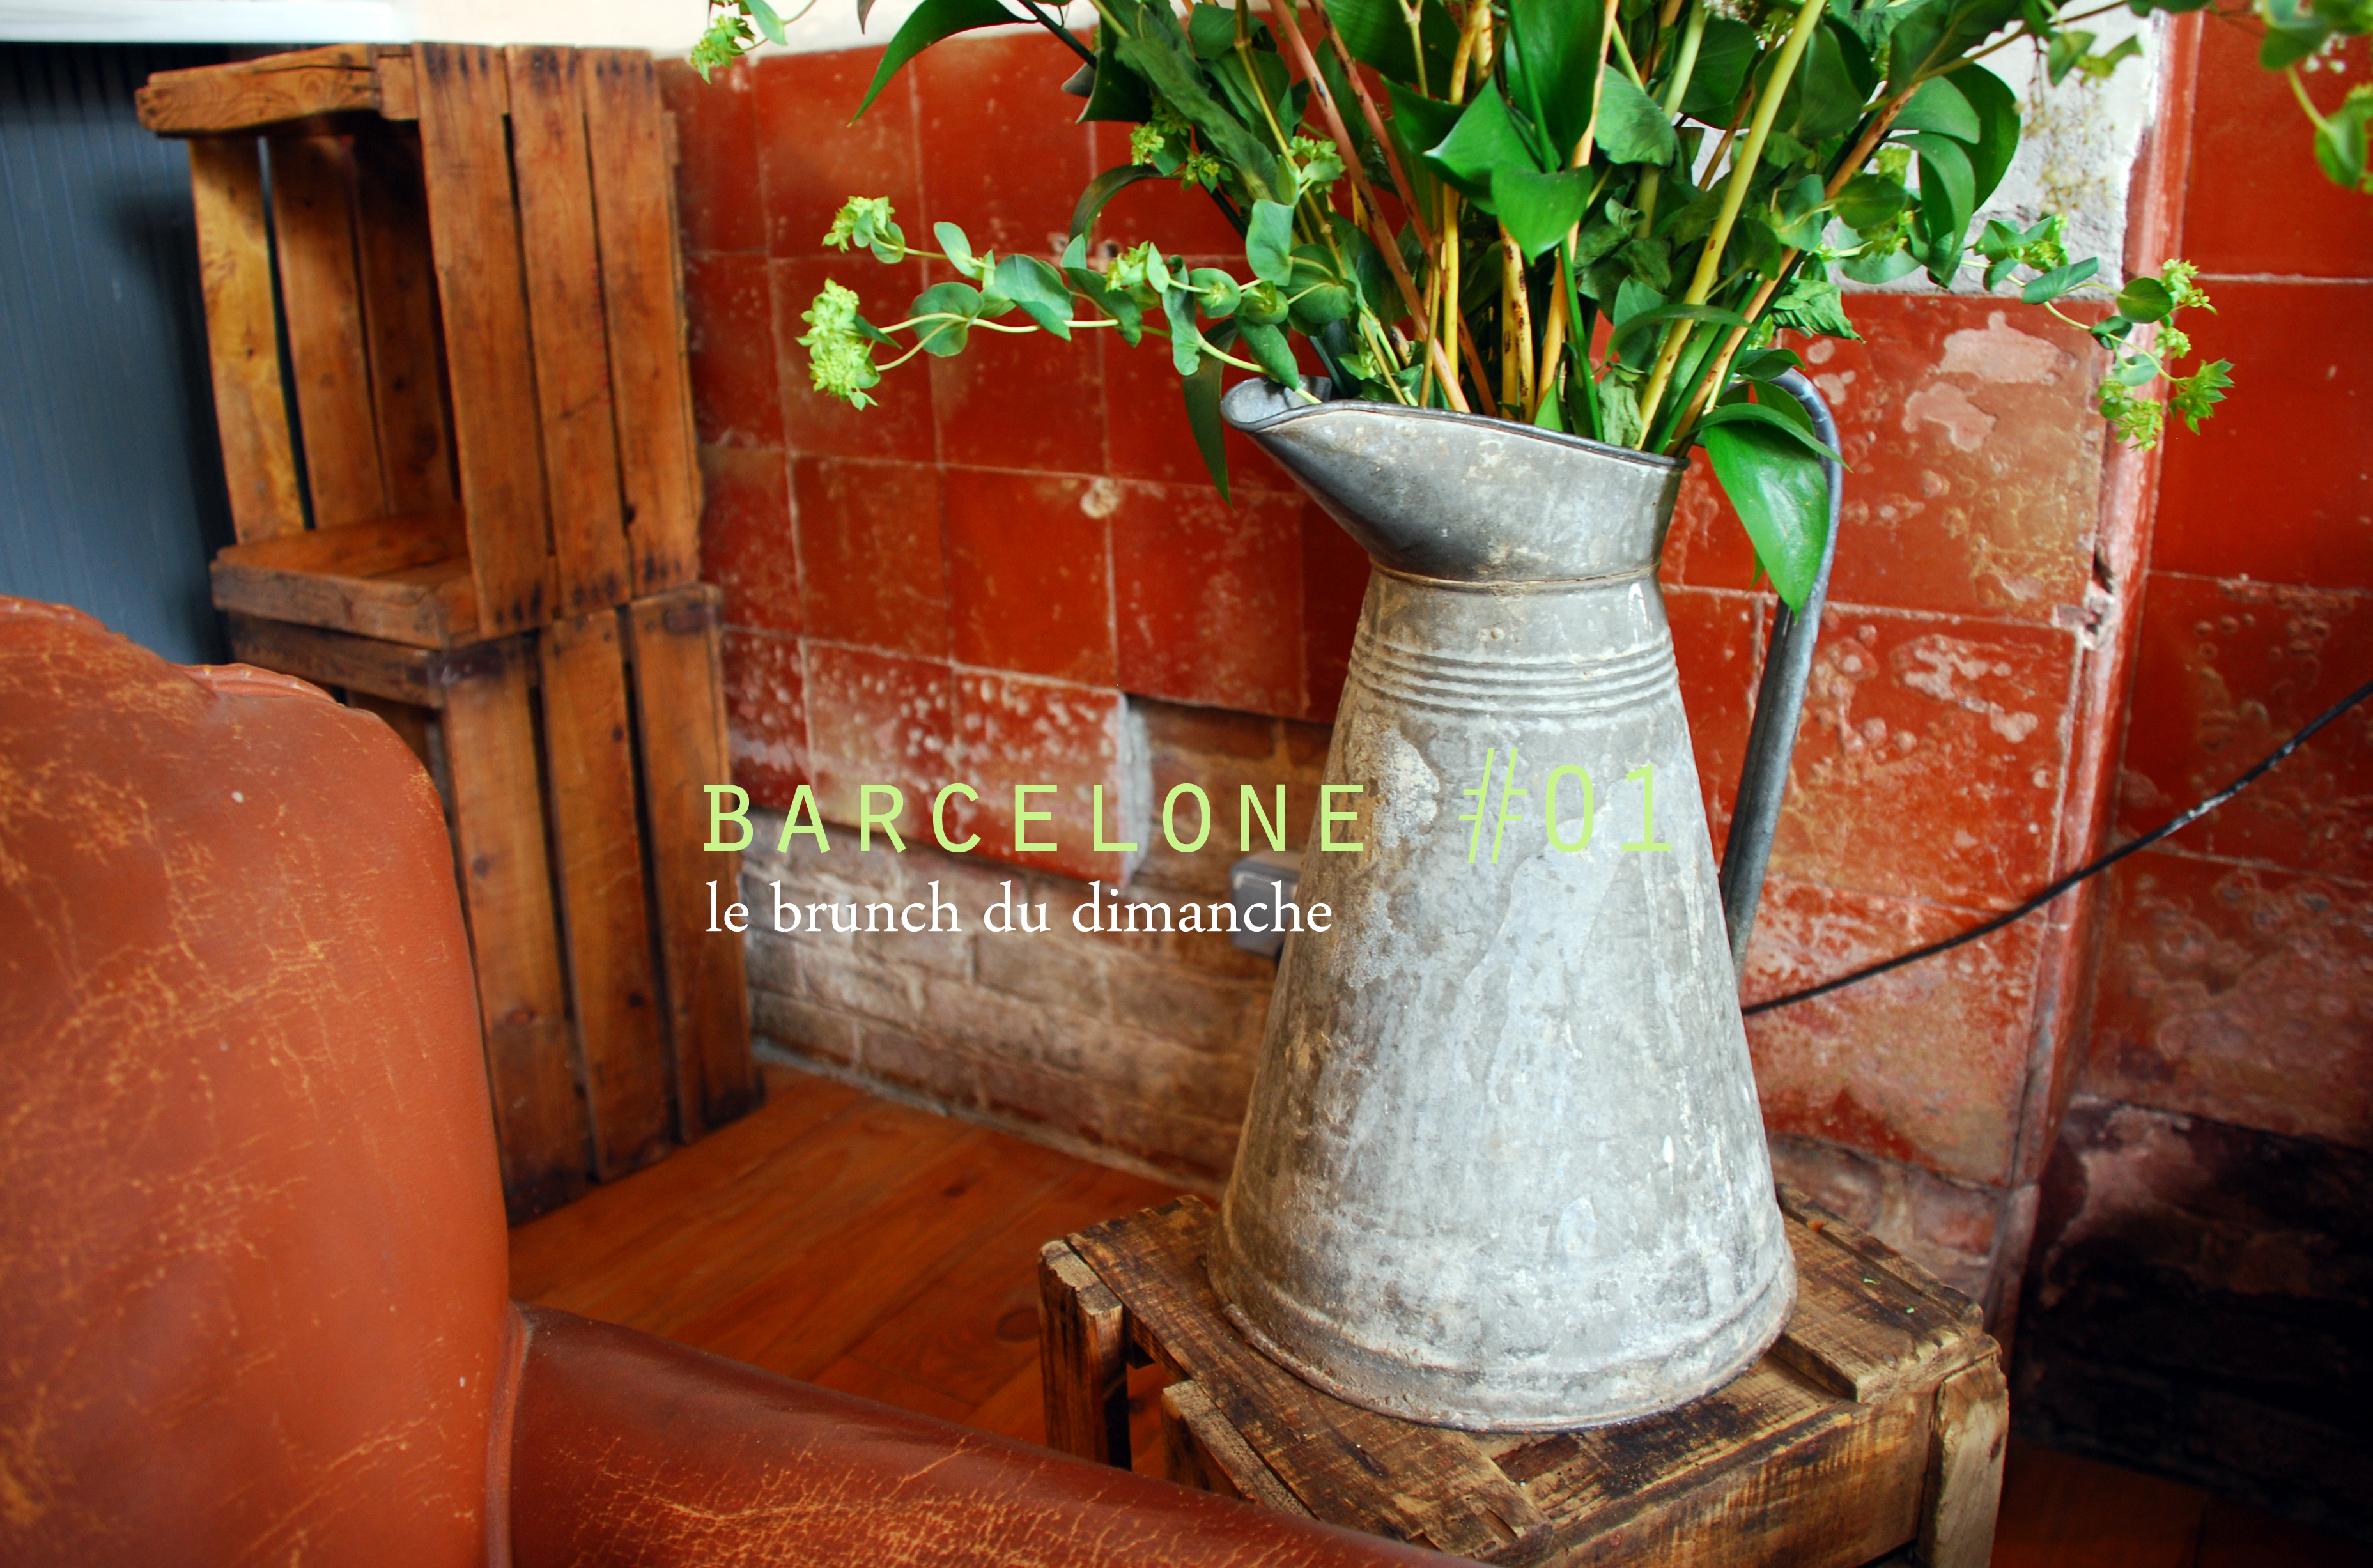 voyage-barcelone-brunch-granja-petit-bo-by-le-polyedre_visuel